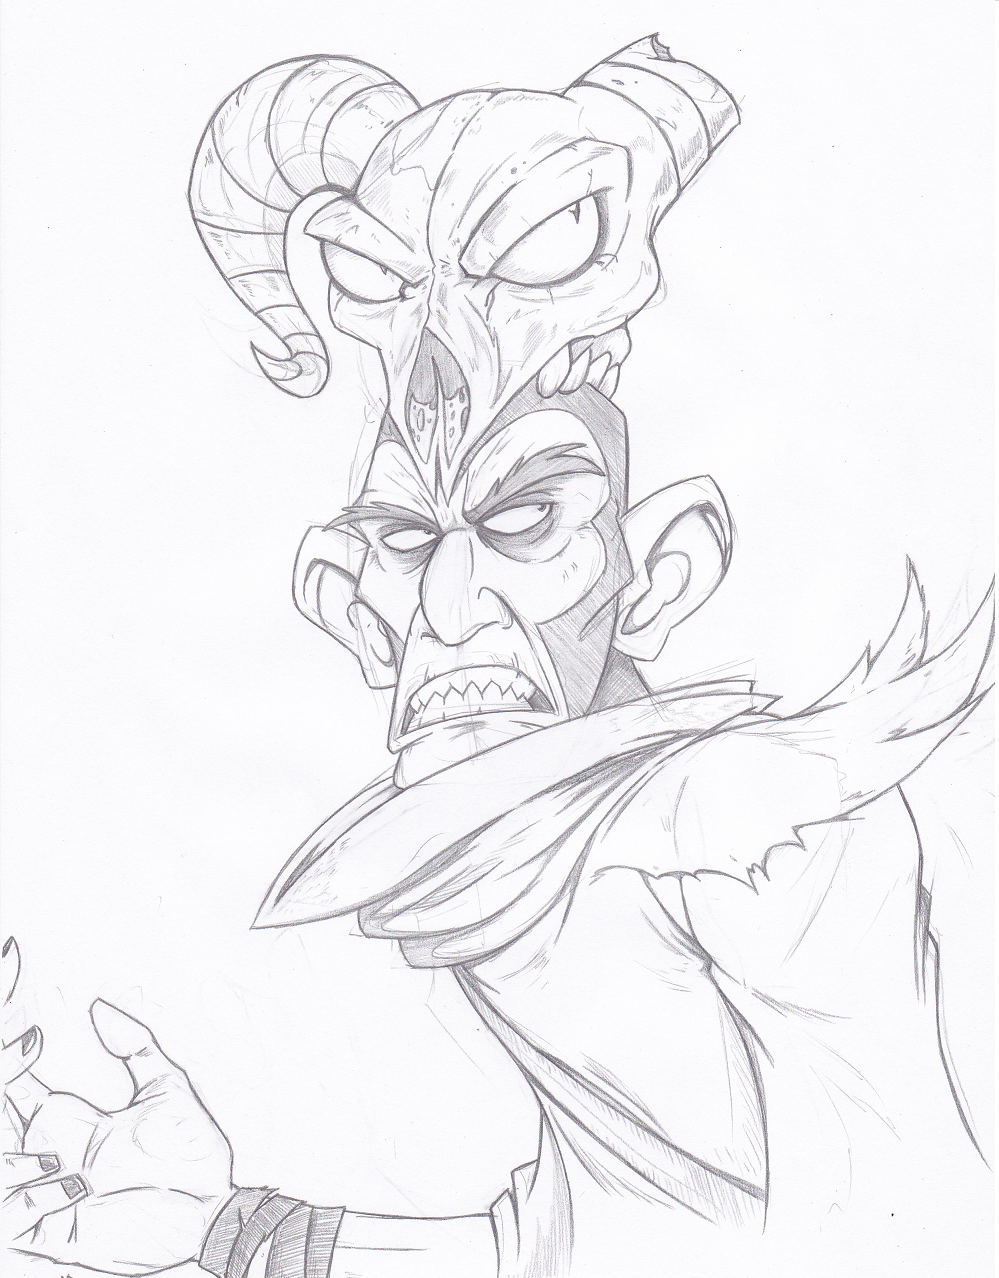 Merasmus The Wizard by Joey-Darkmeat